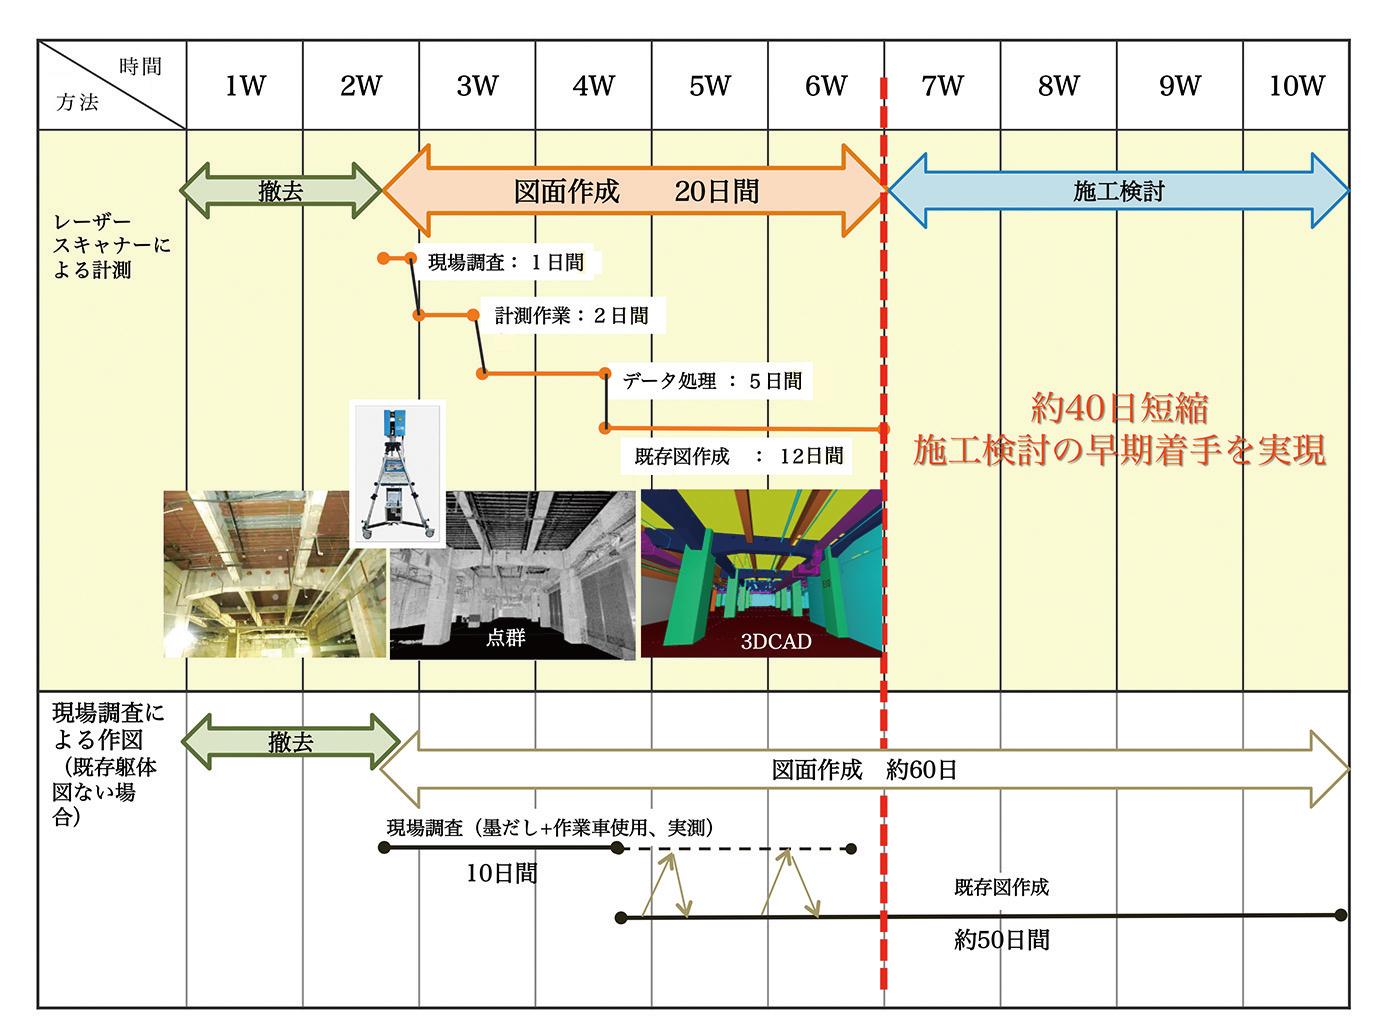 図-1 現状把握と図面化作成時間−従来との比較